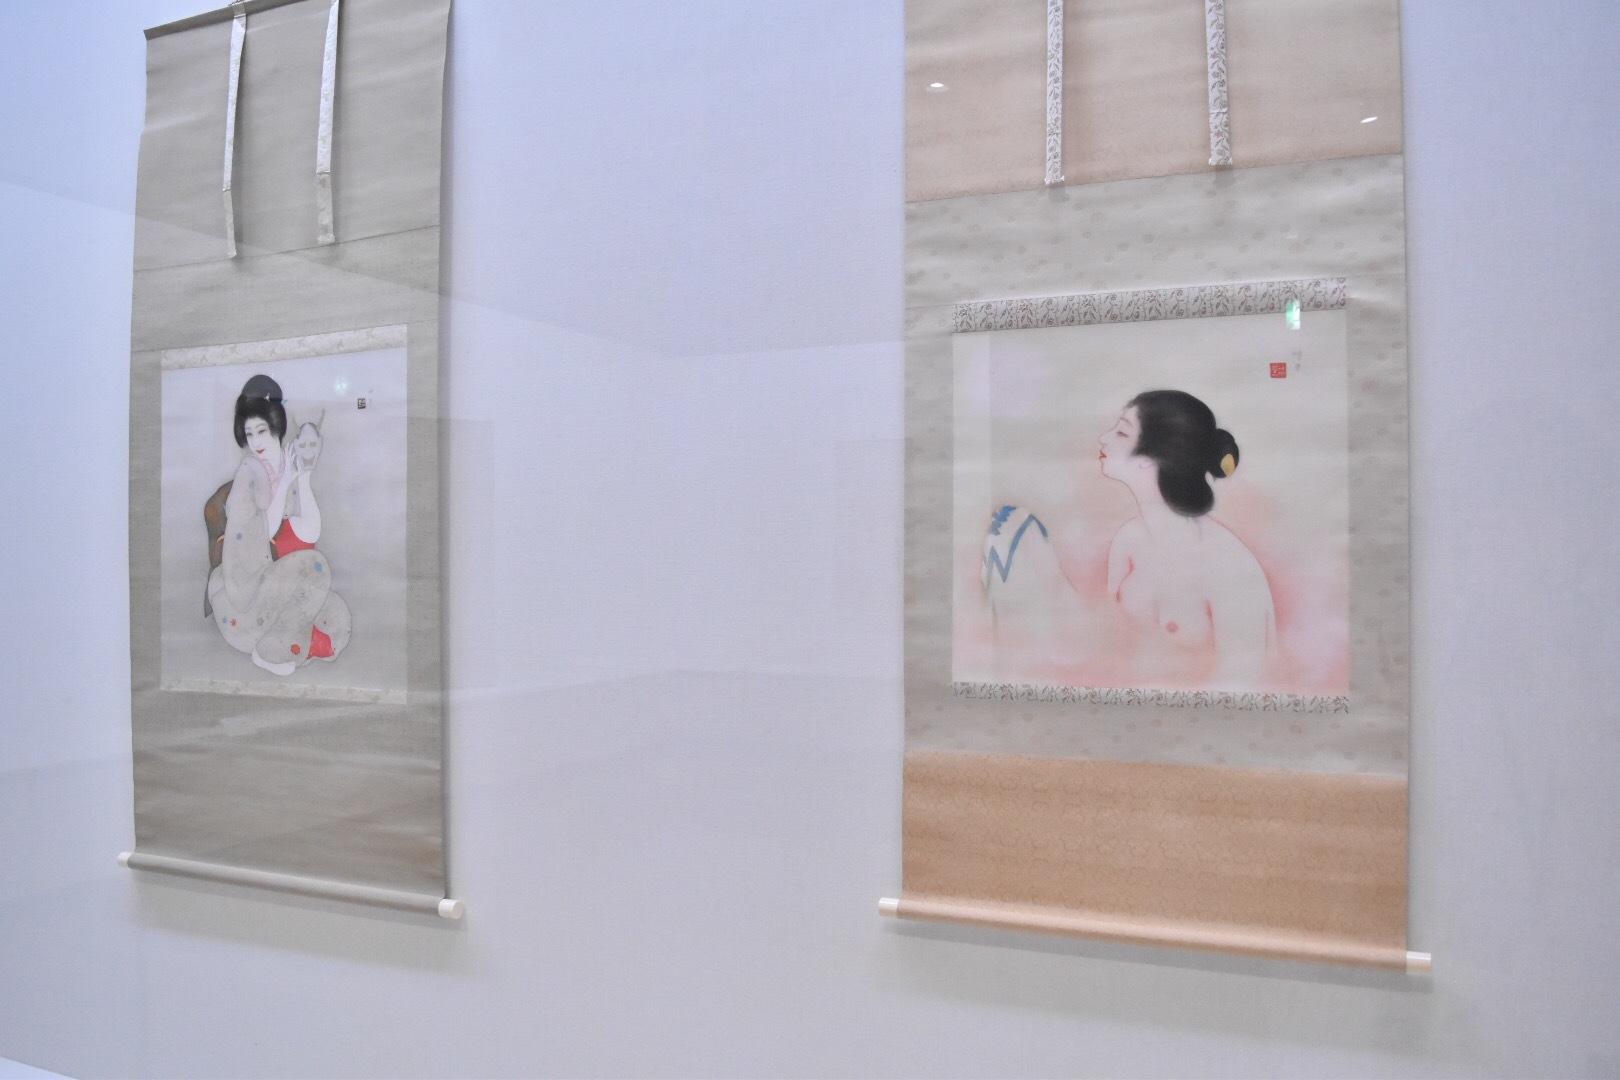 左:岡本神草 《仮面》 昭和2(1927)年 培広庵コレクション 右:岡本神草 《浴》 大正14(1925)年